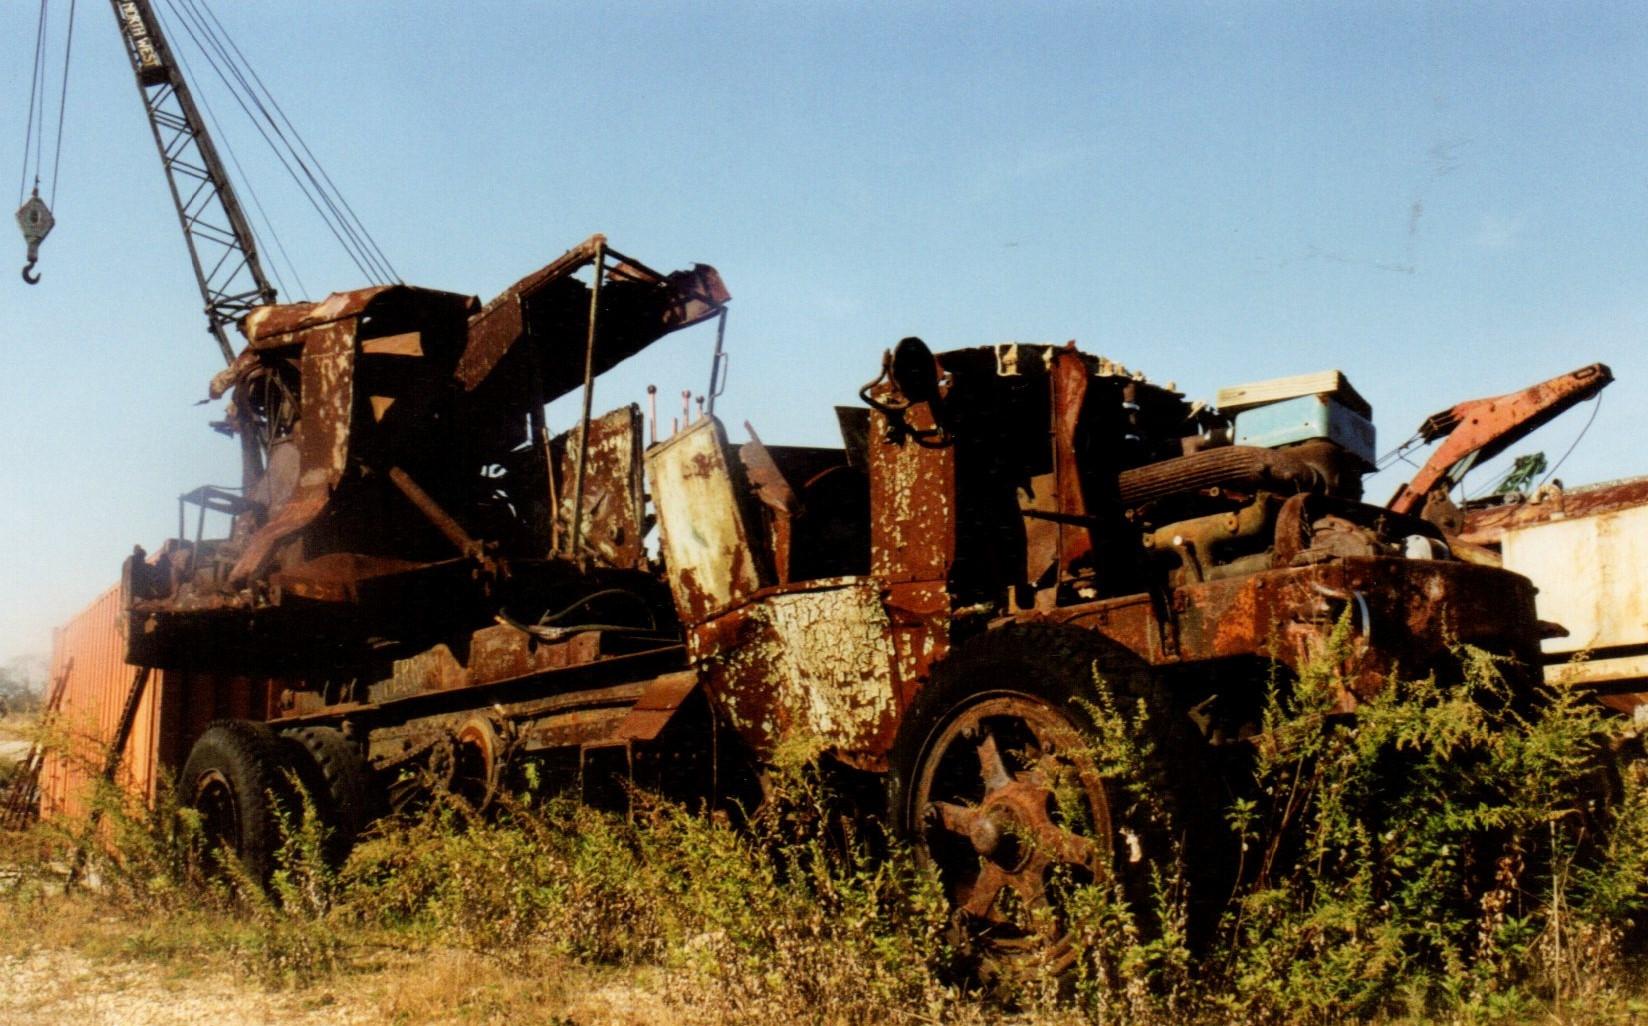 Remains of an AC Mack crane